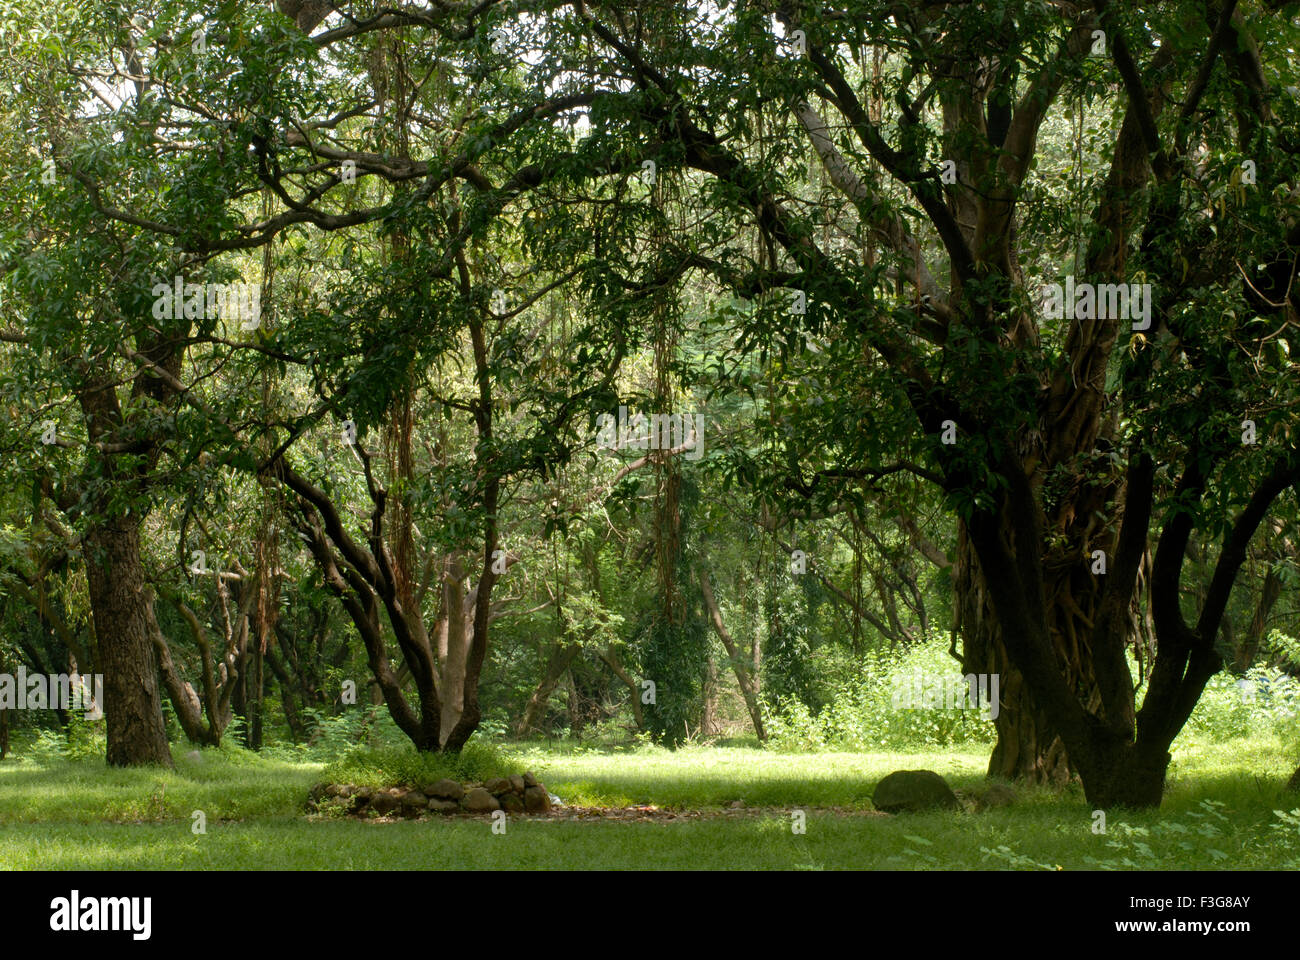 lush green grass at Sanjay Gandhi